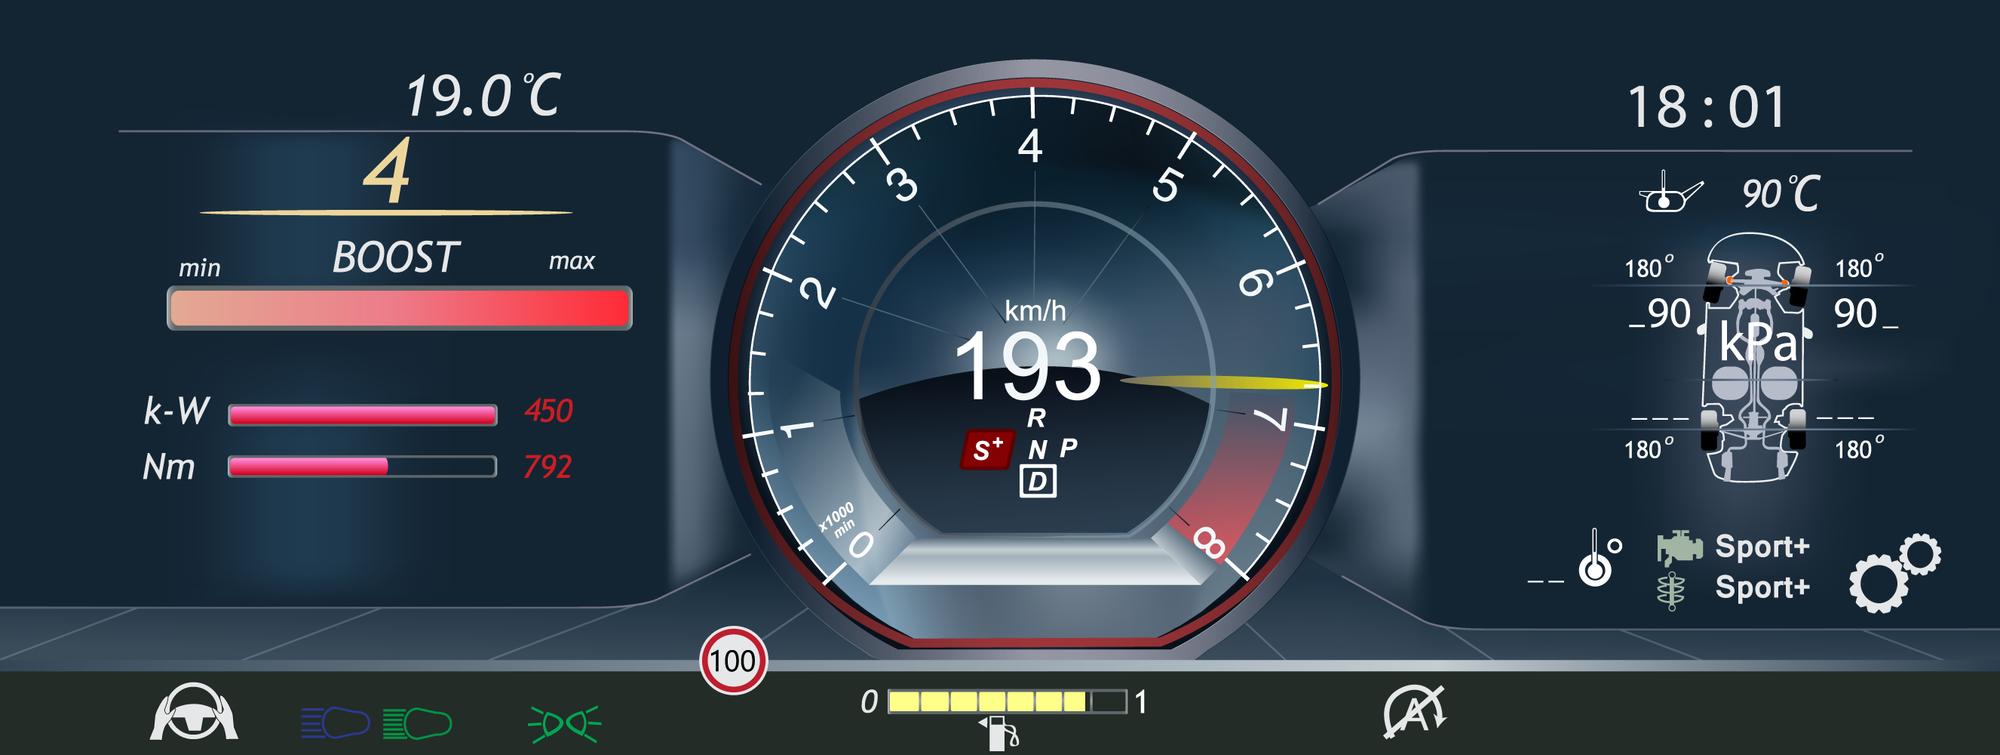 How to Replace a Vehicle Speed Sensor | DoItYourself com